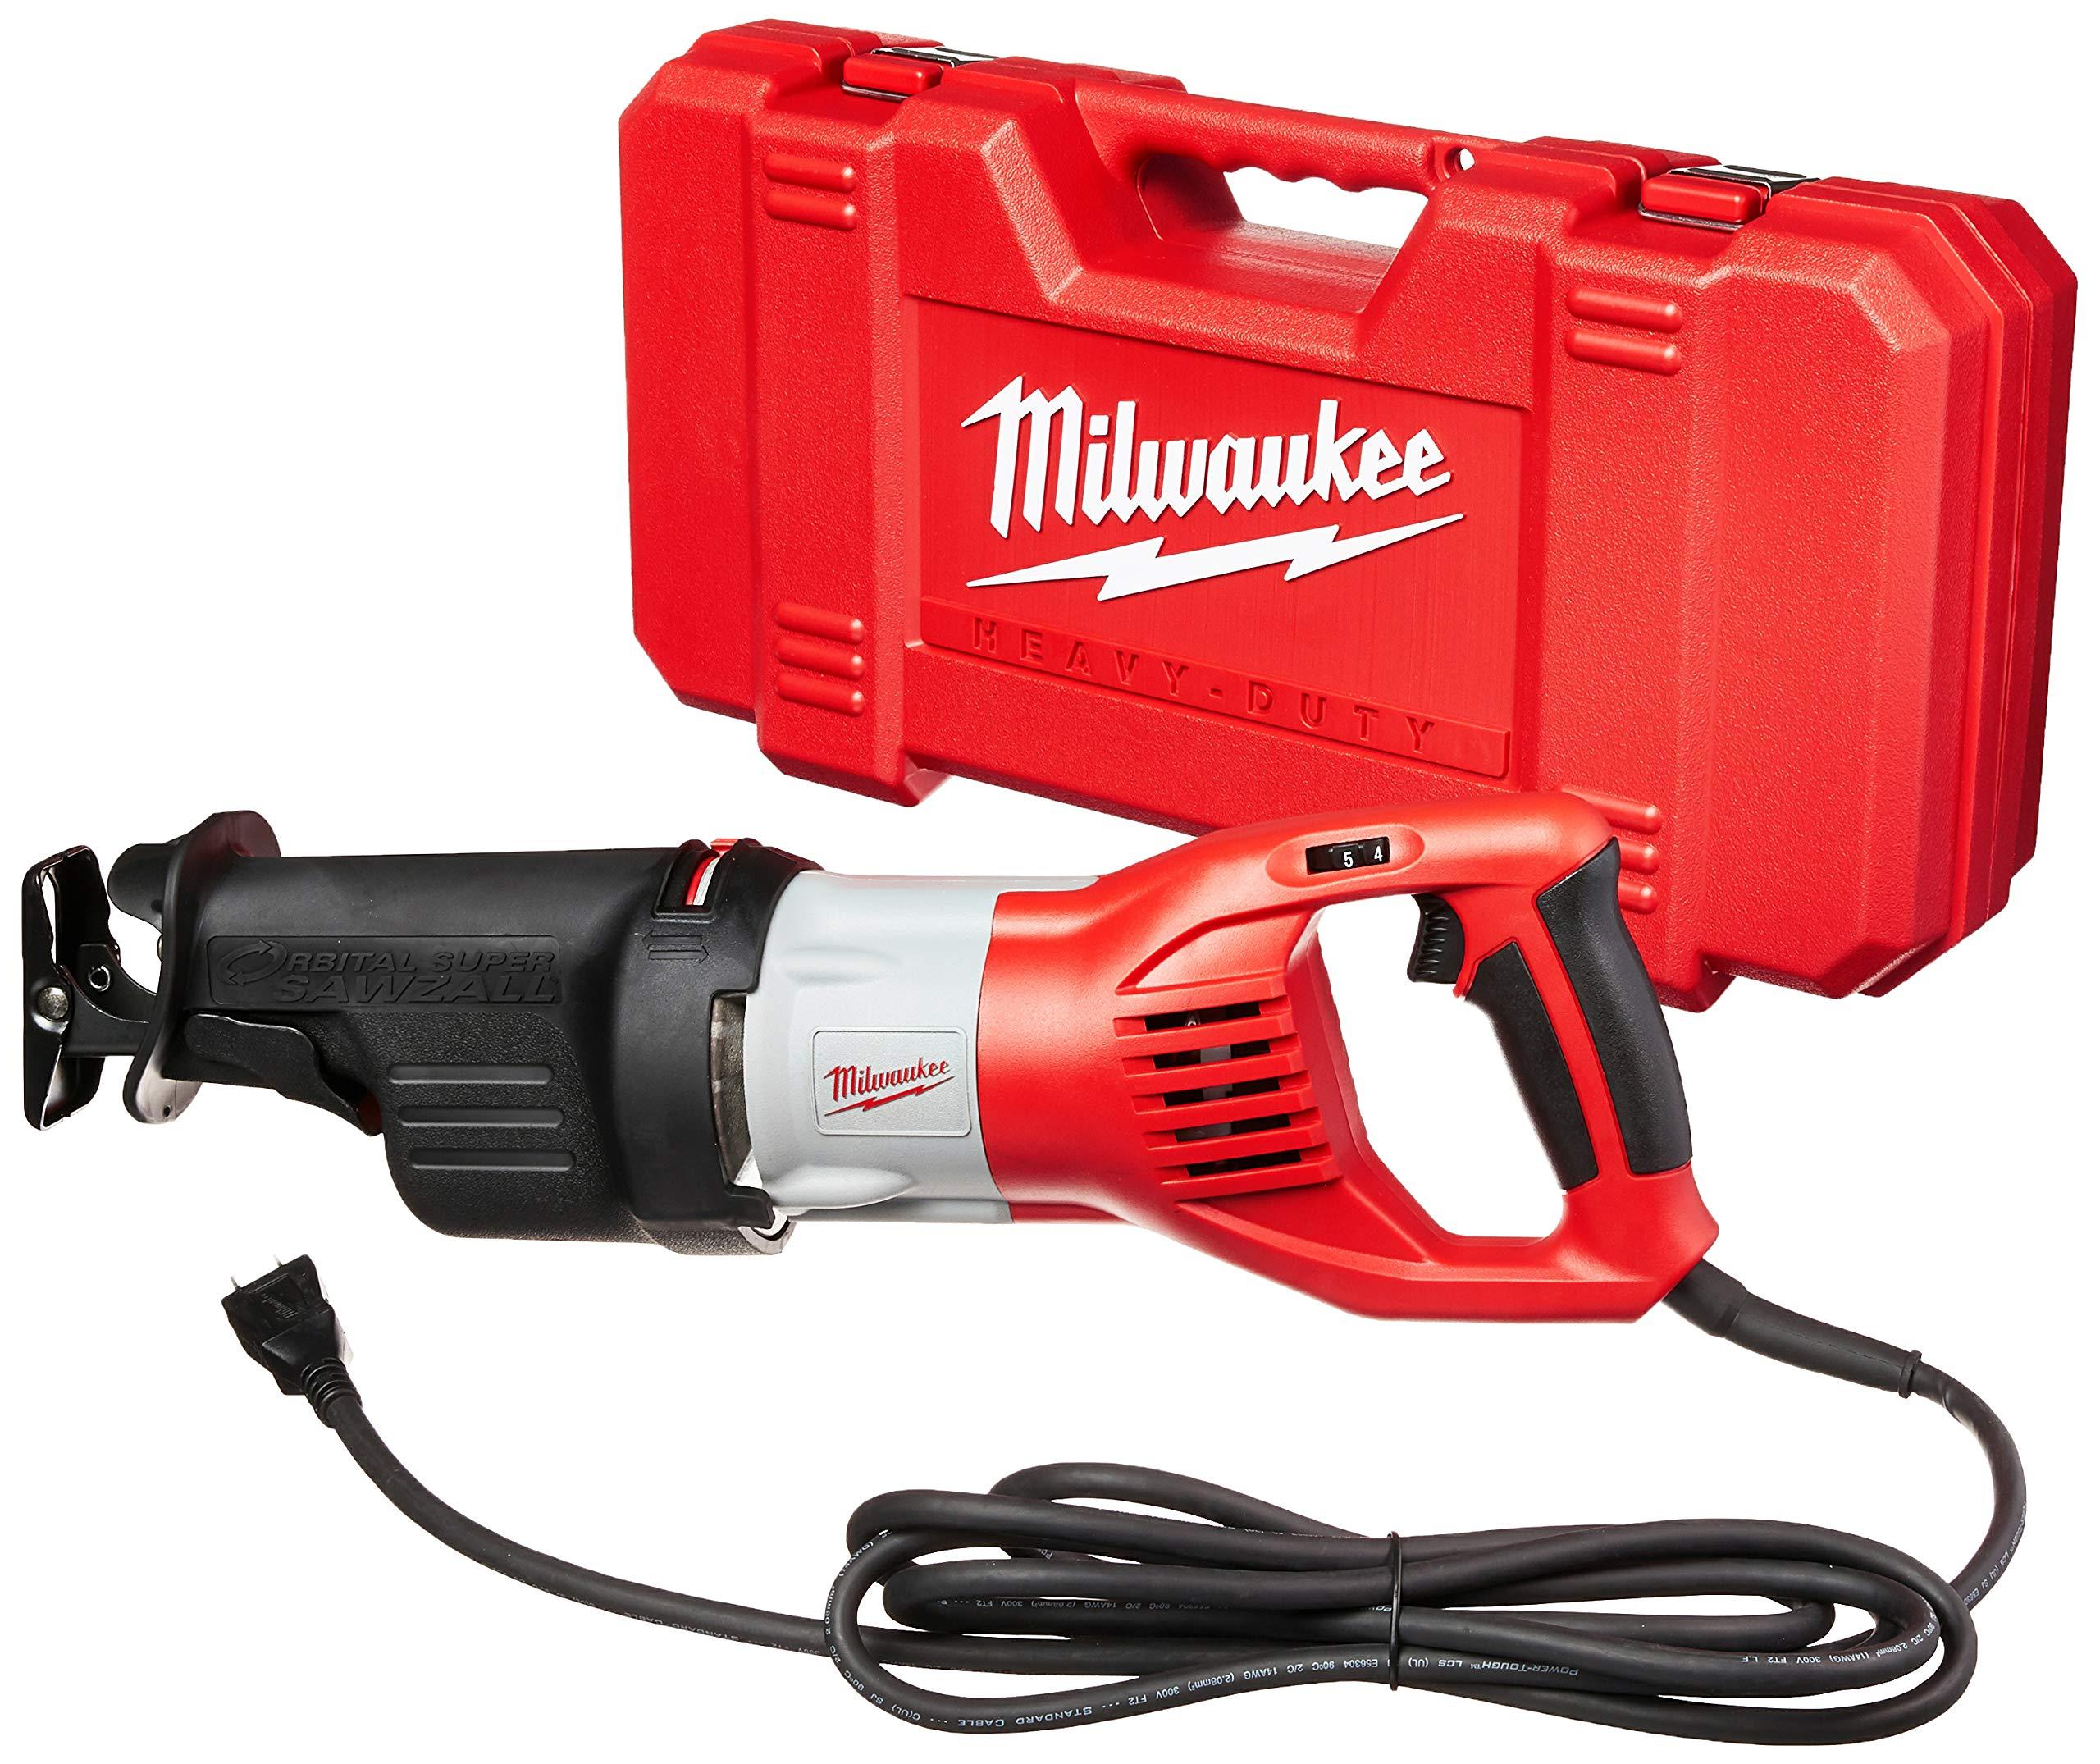 Milwaukee 6538-21 15.0 Amp Super Sawzall Reciprocating Saw by Milwaukee